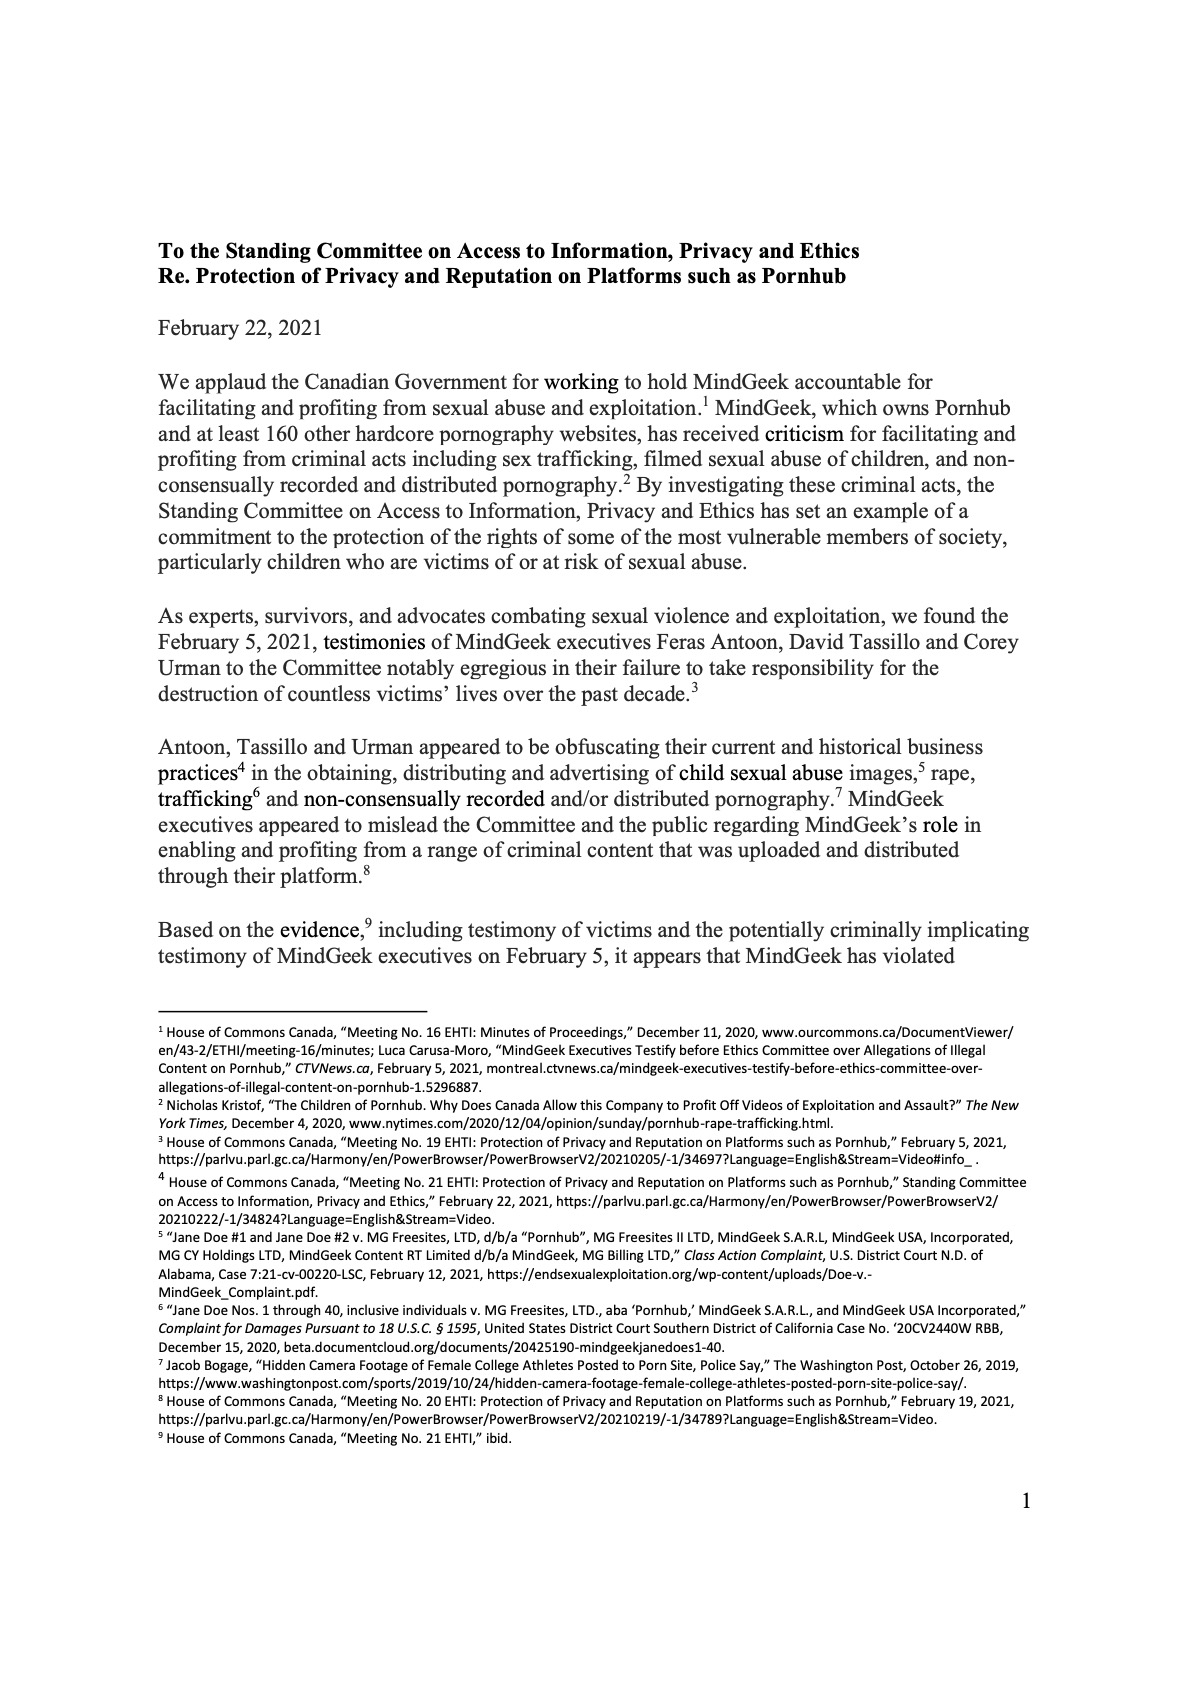 CollectiveOf104Survivors525Non-GovernmentOrganisationsFrom65Countries-e.jpg